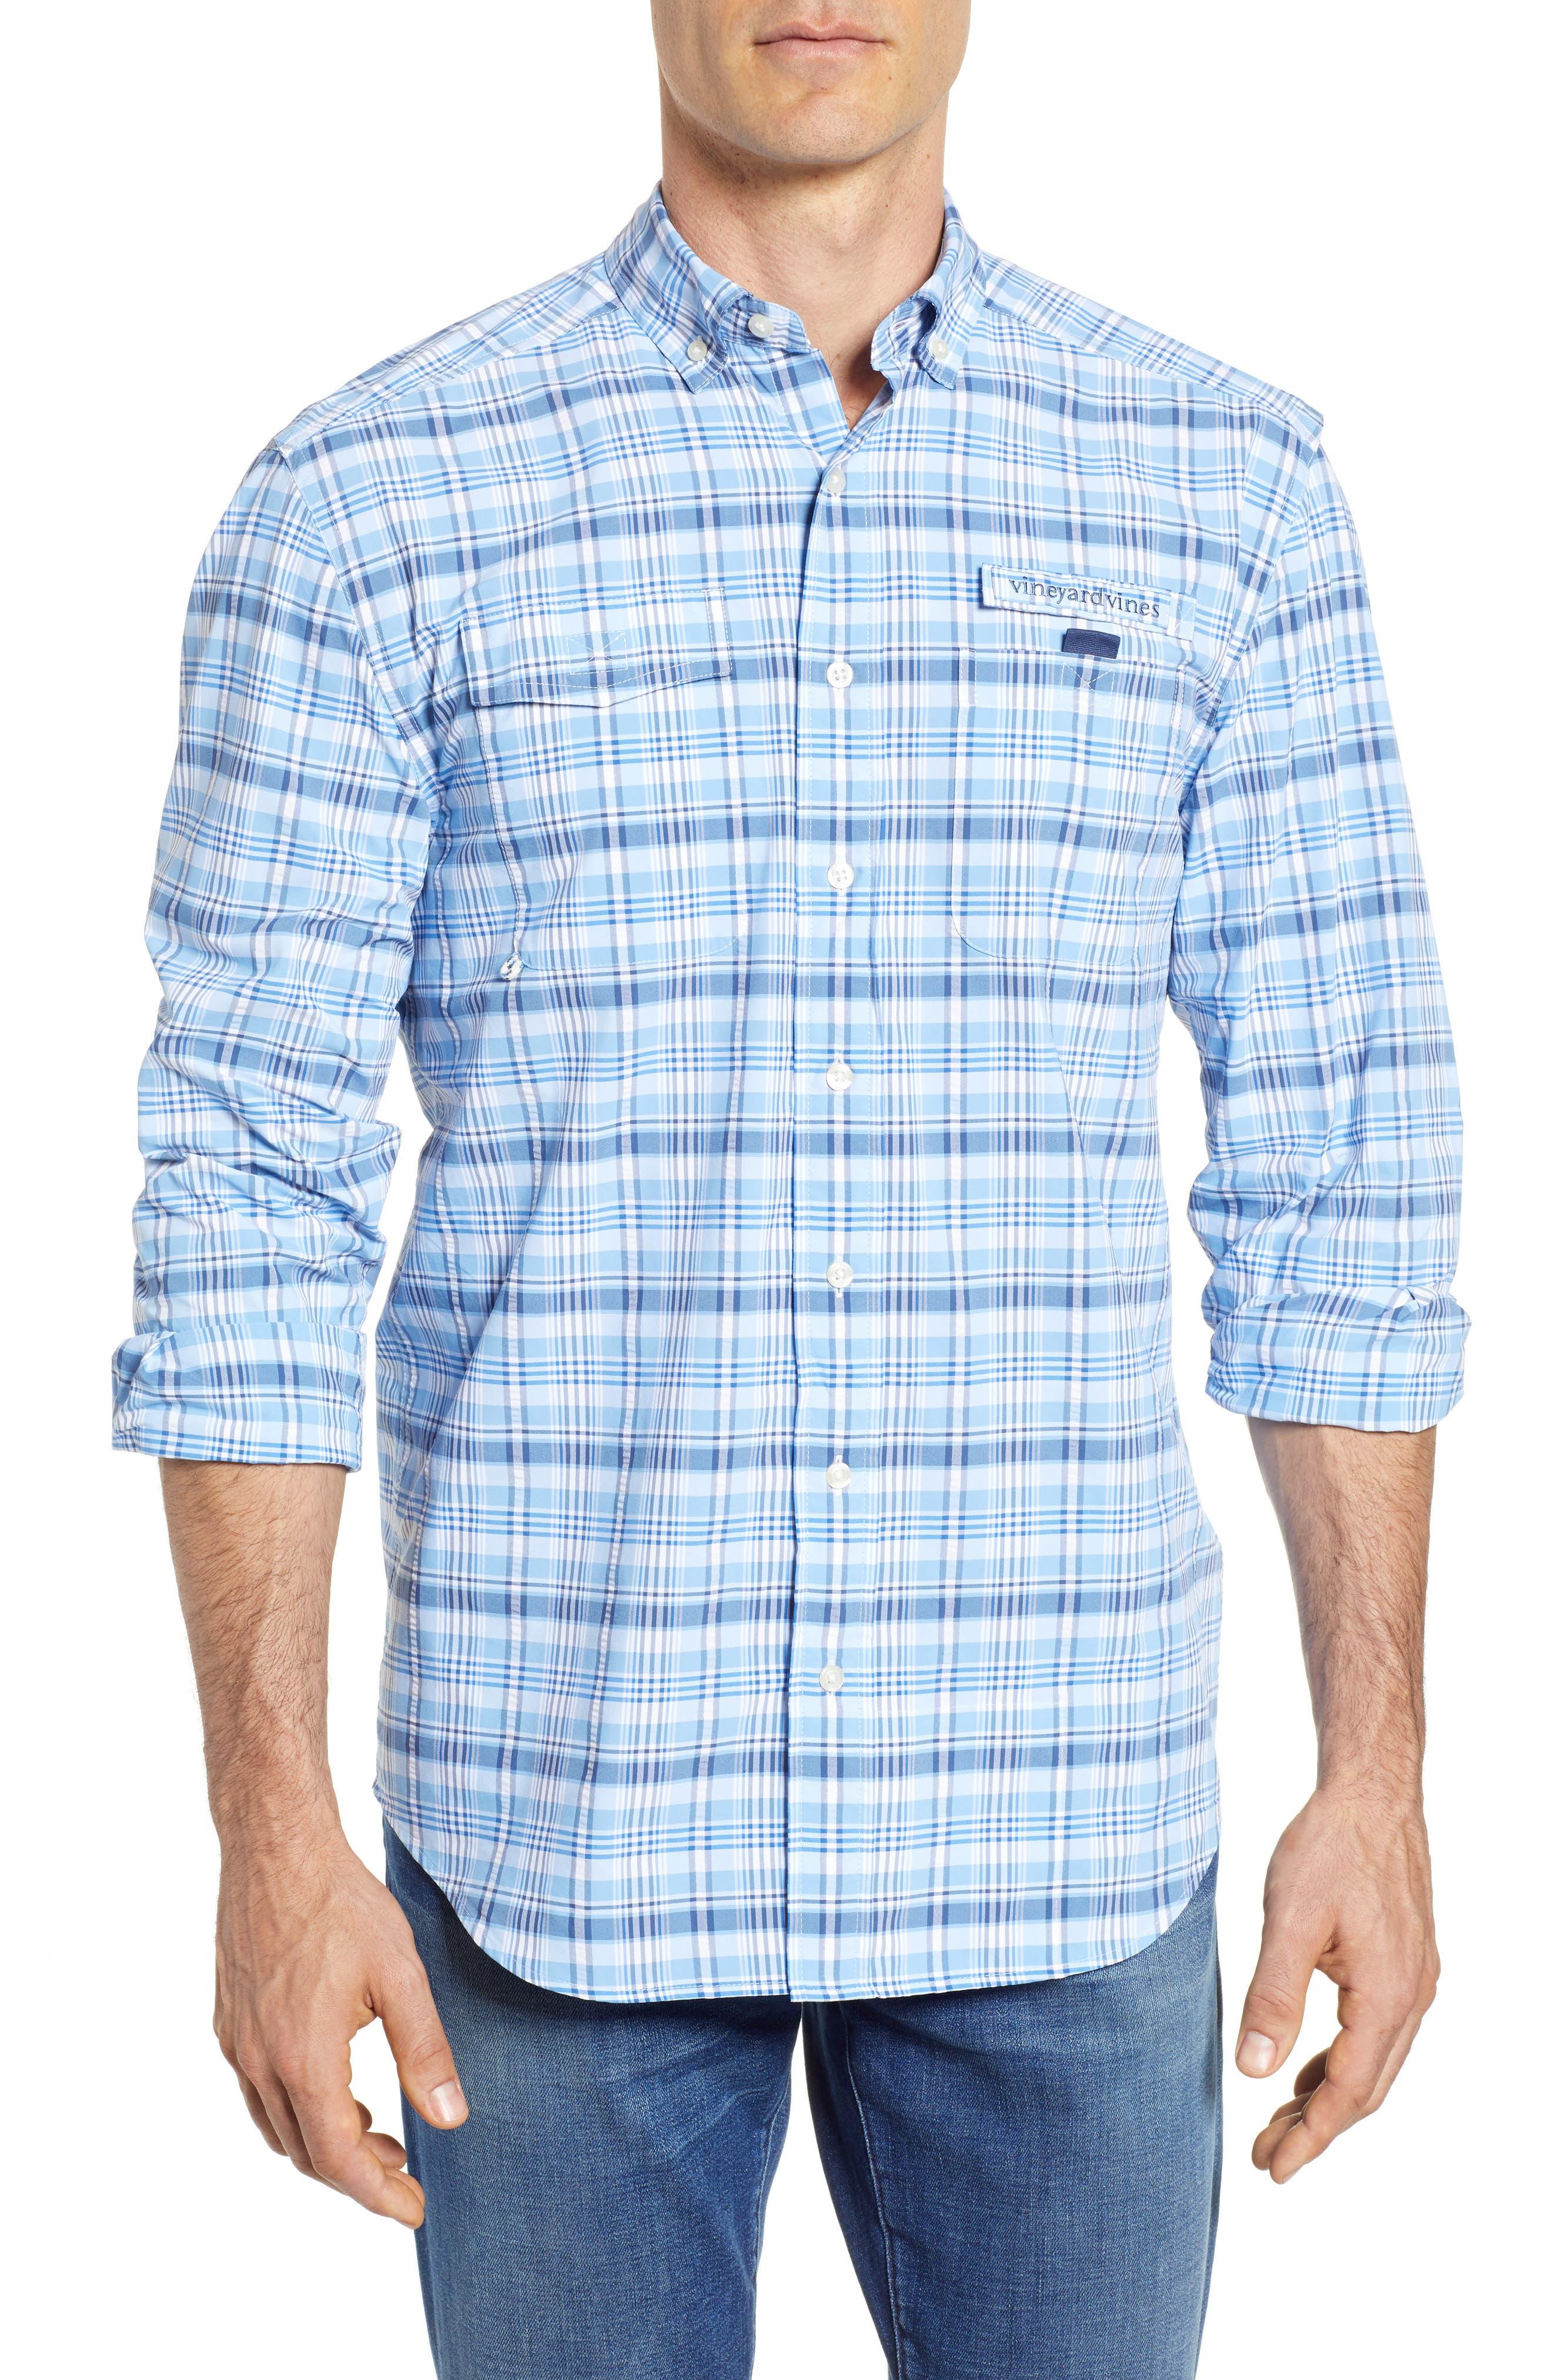 Prospect Hill Harbor Regular Fit Plaid Performance Sport Shirt,                         Main,                         color, 484